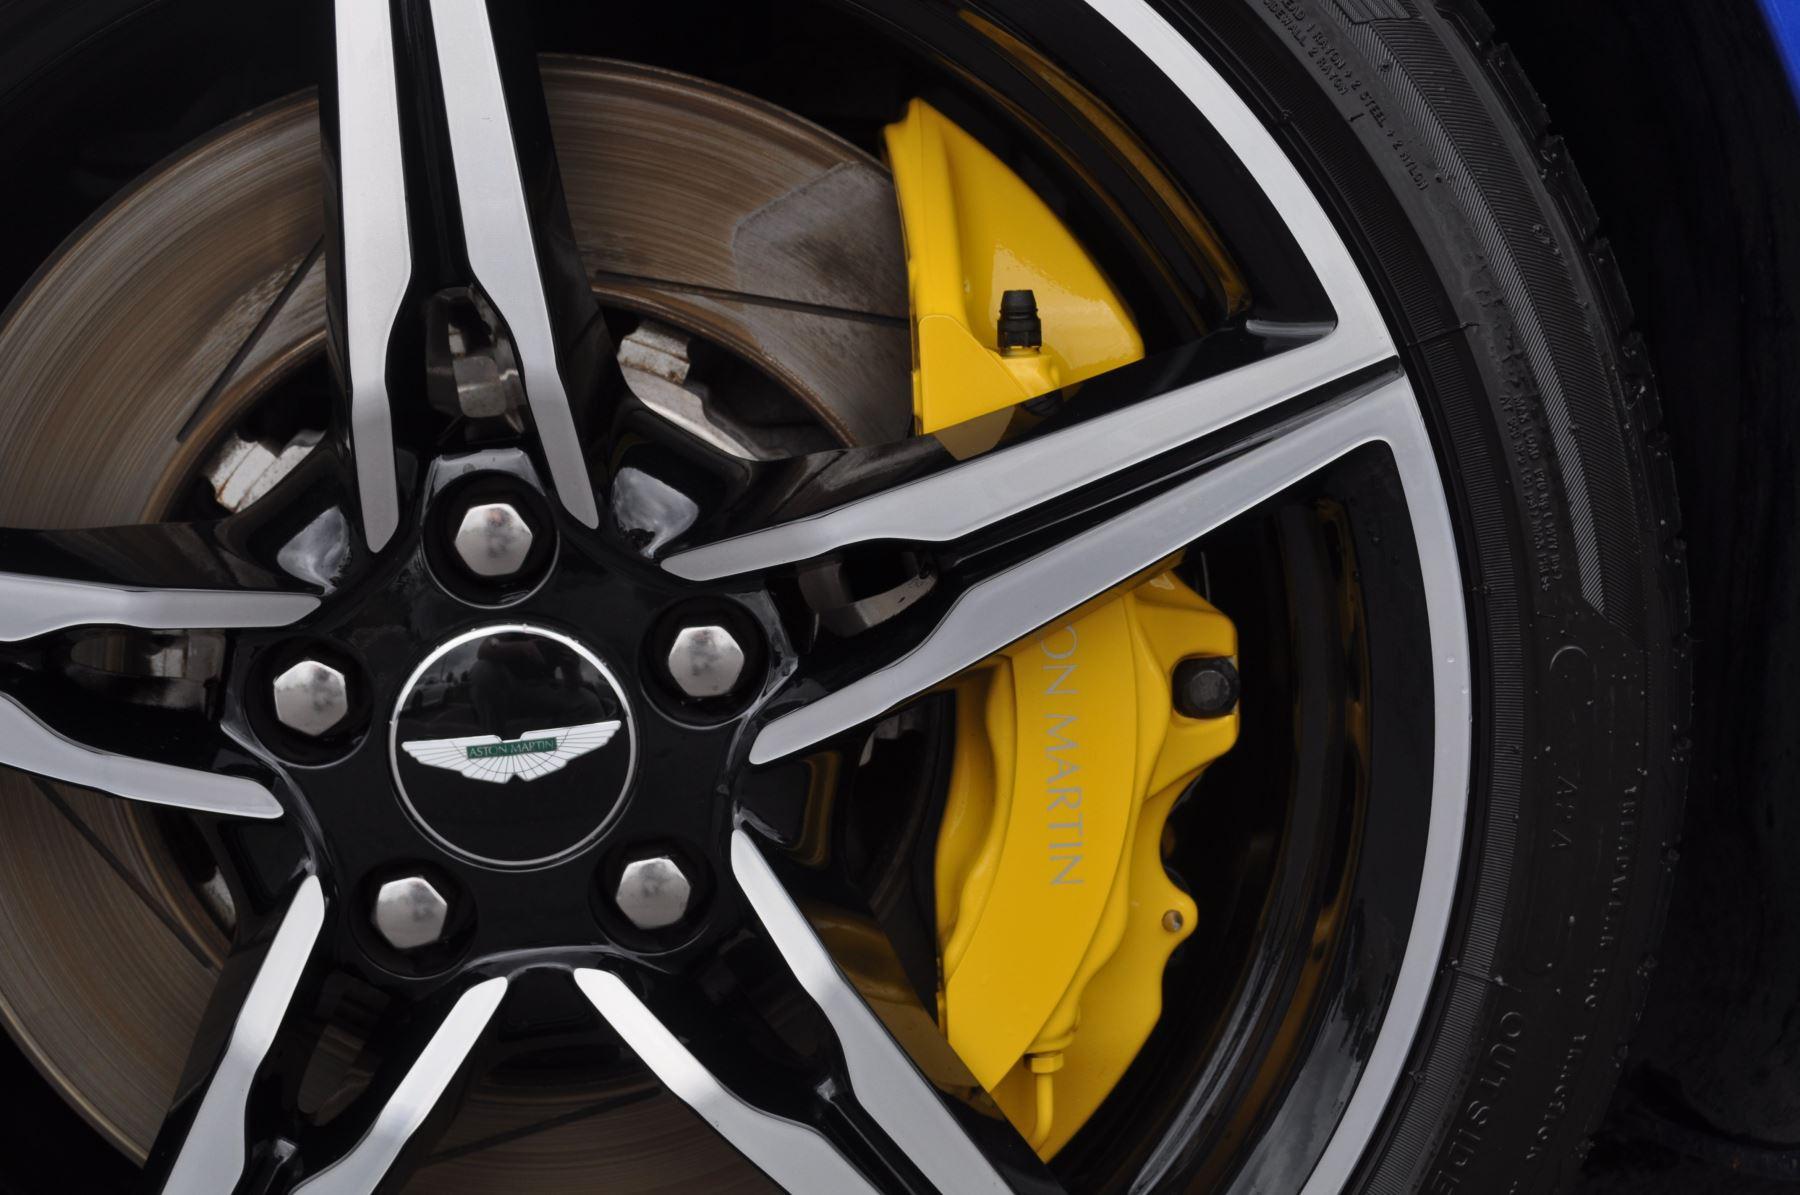 Aston Martin V8 Vantage S Coupe S 2dr Sportshift image 45